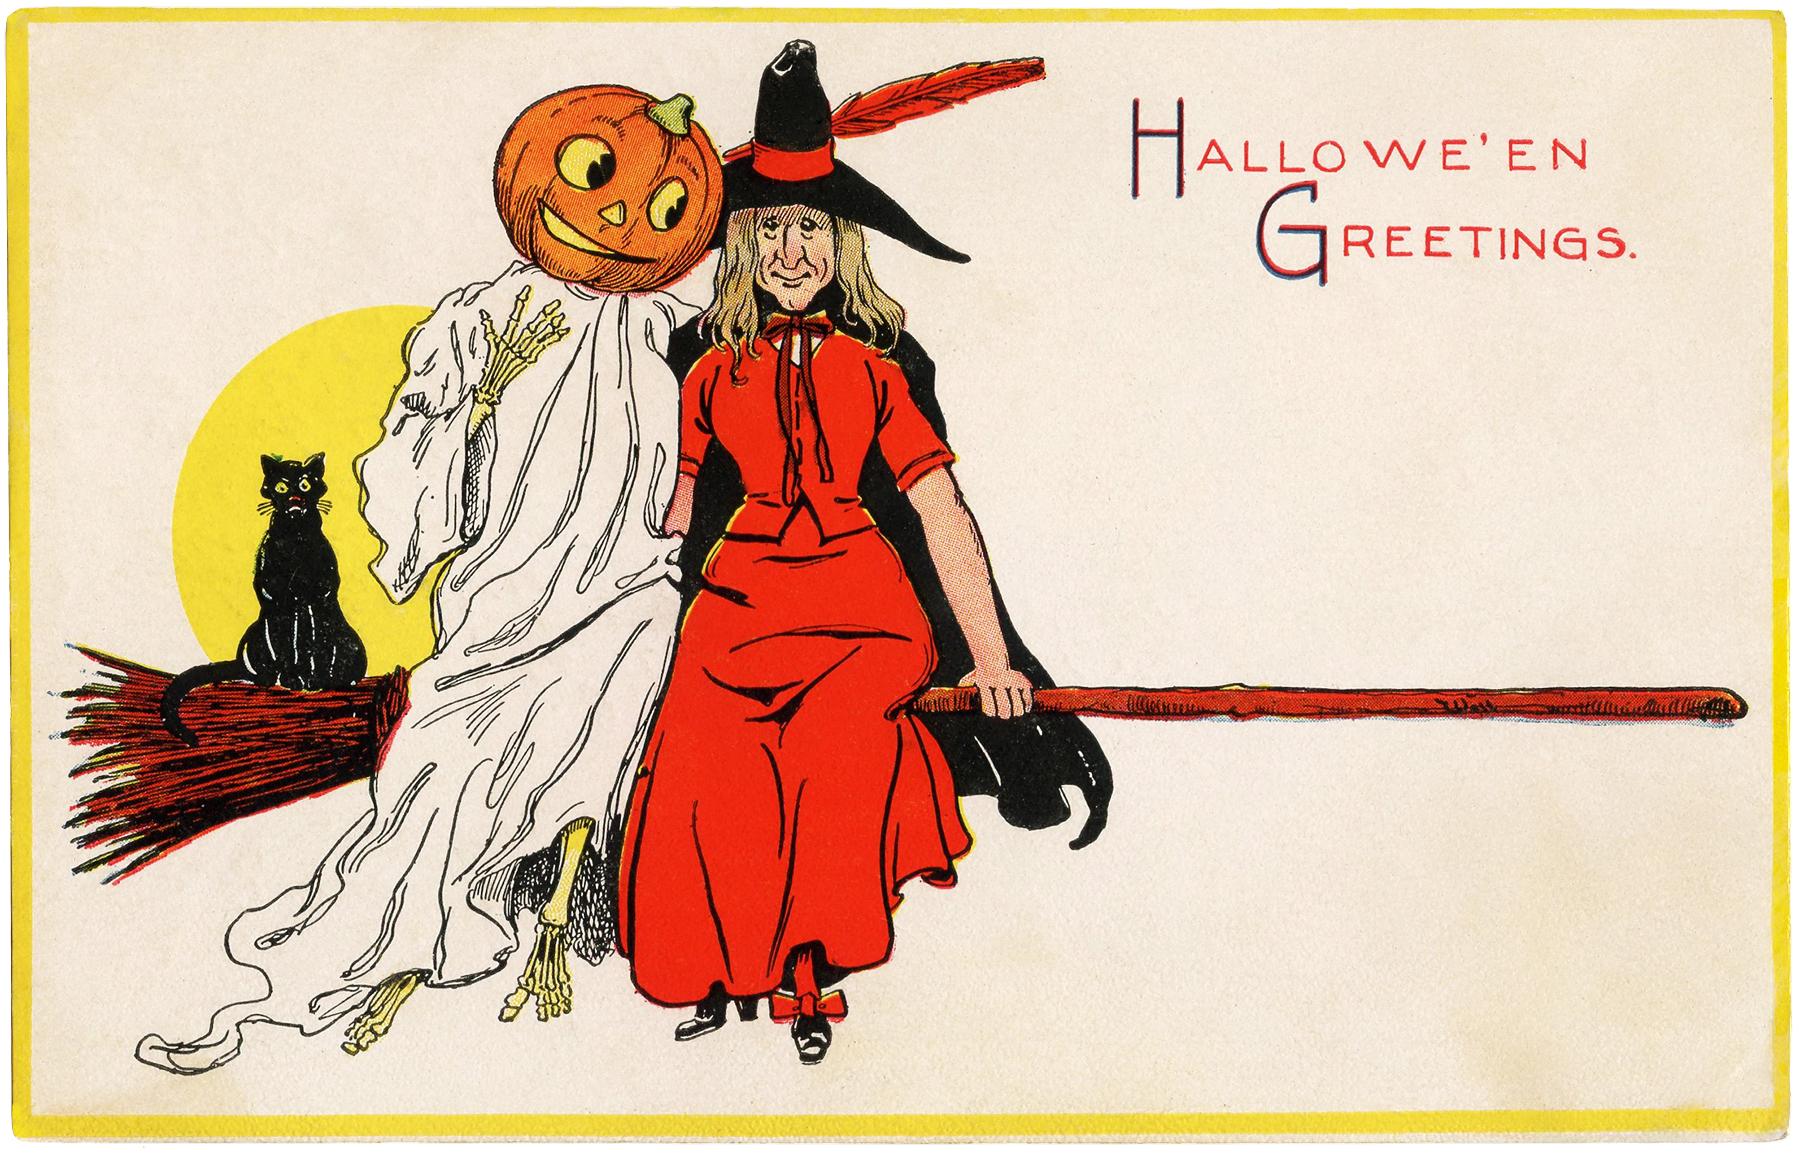 Halloween Pumpkin Head Skeleton Image